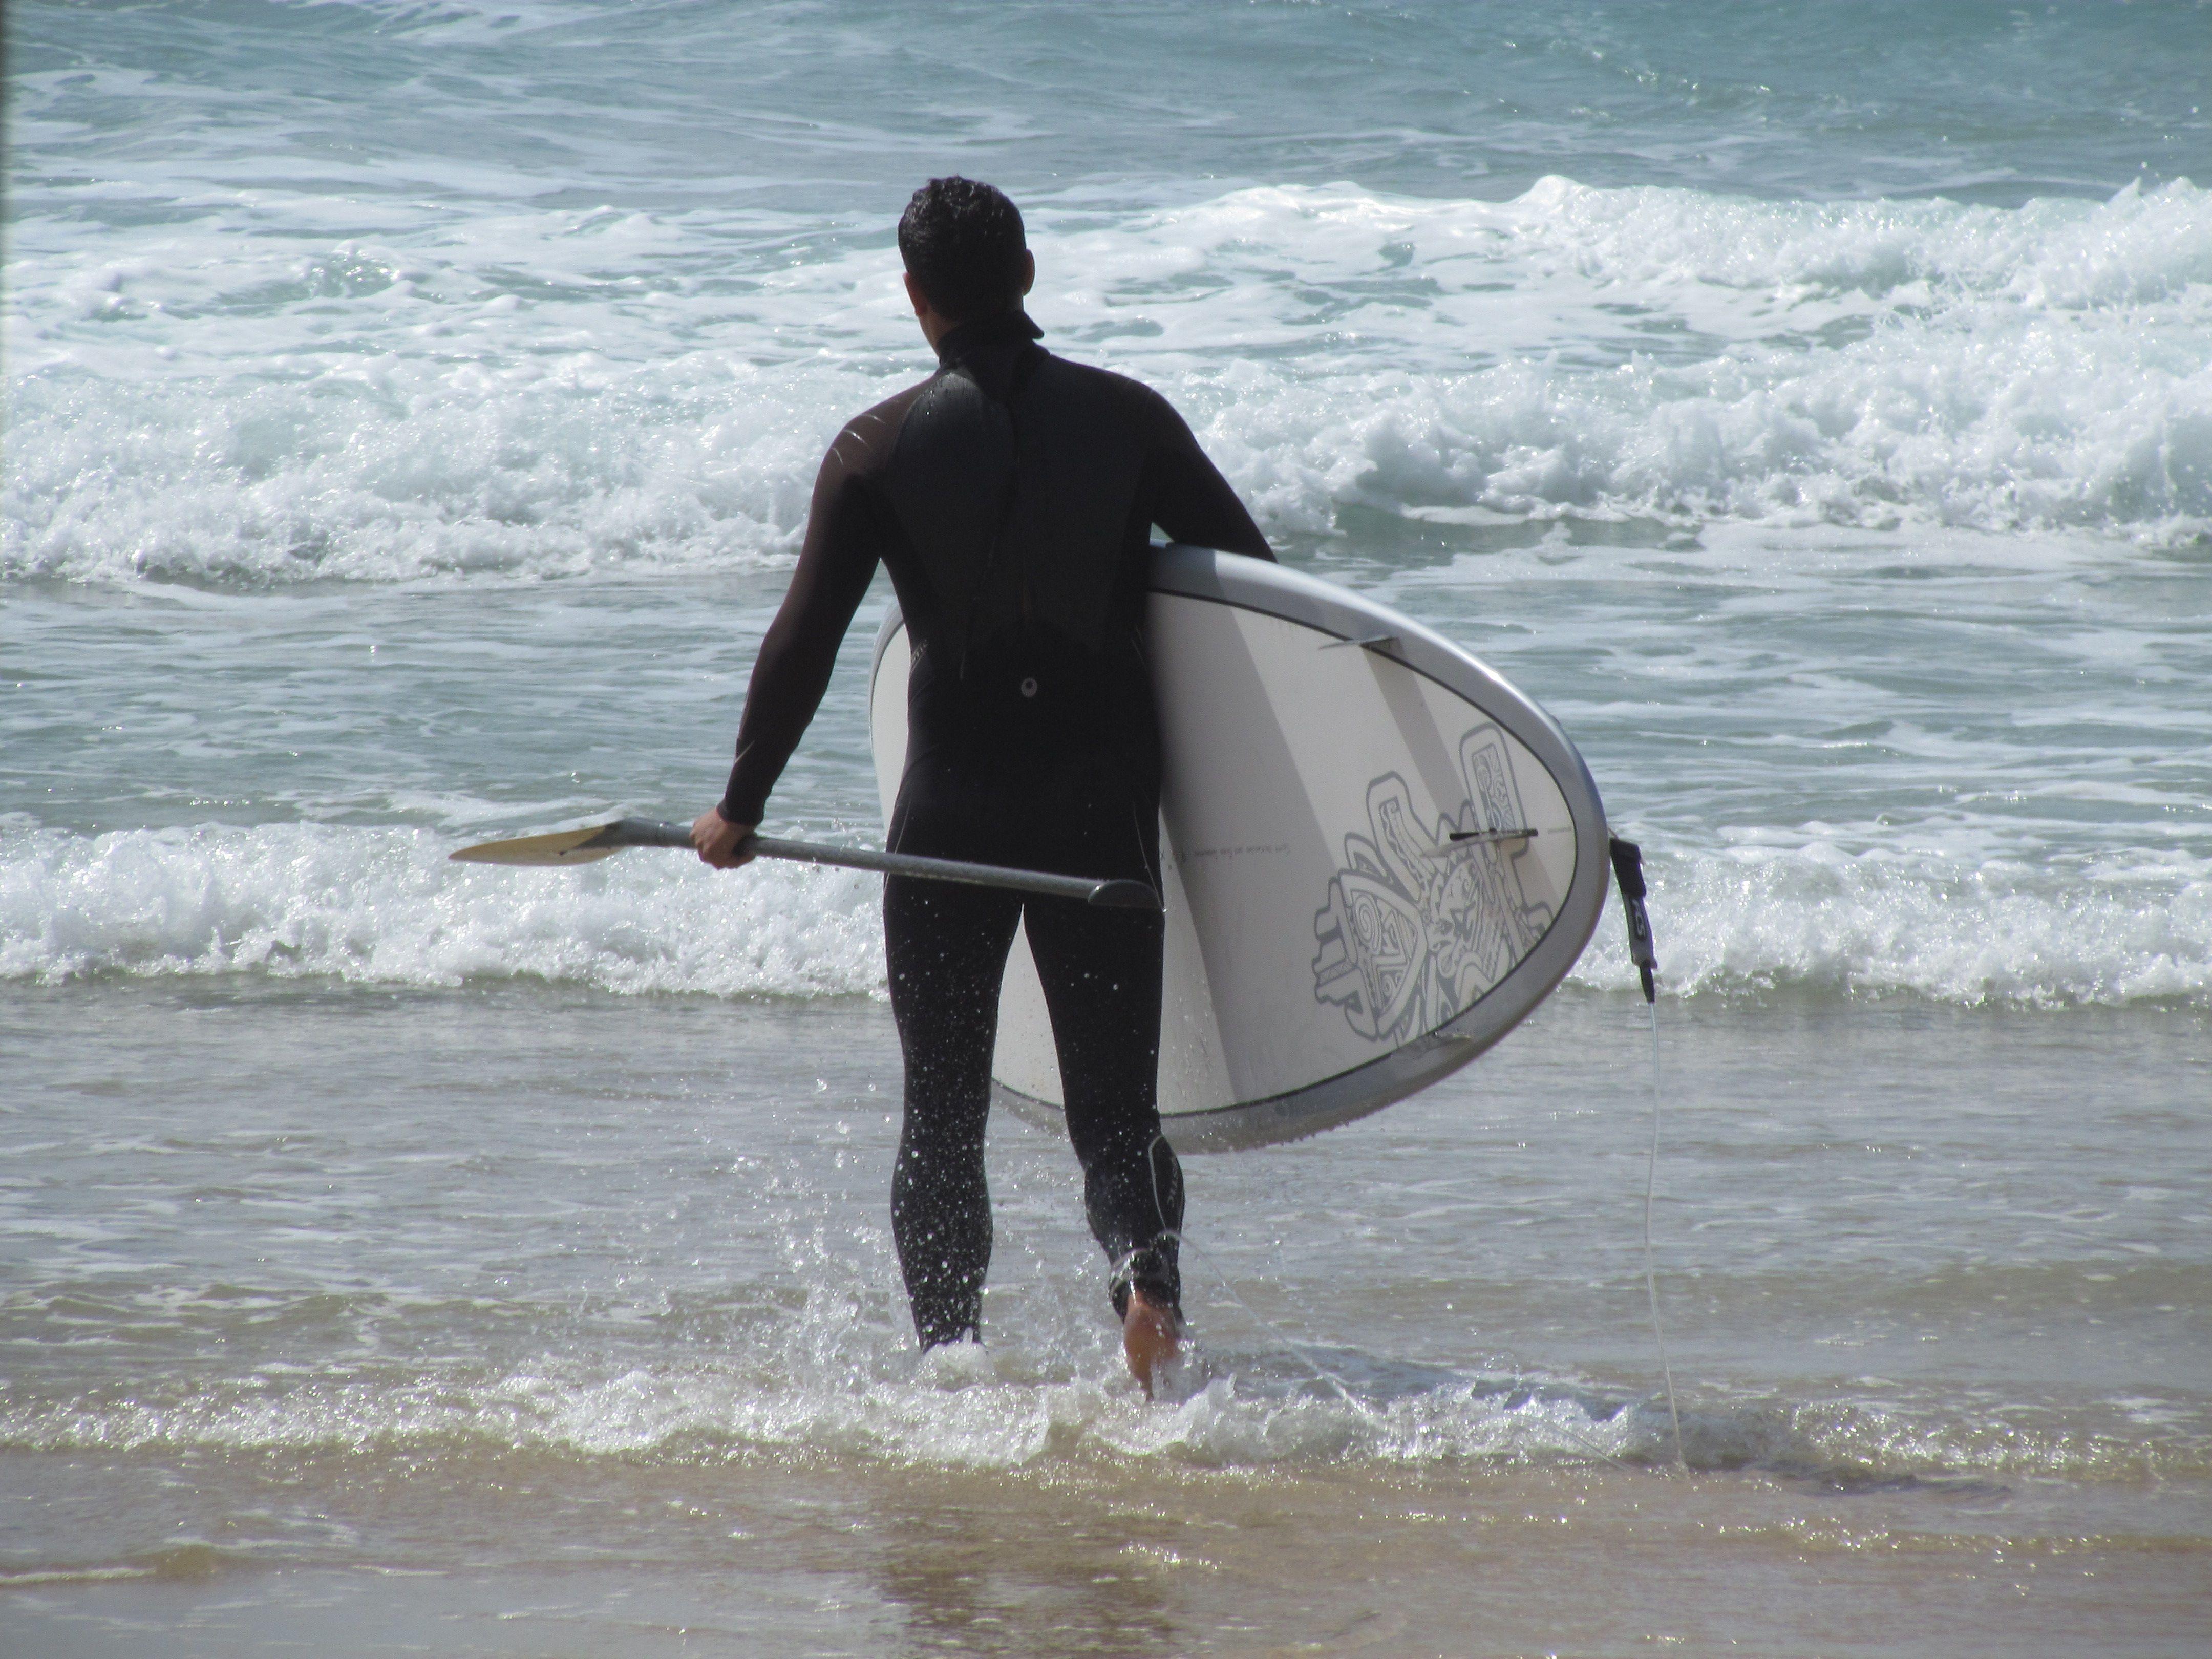 Bodega Bay Surf Shack Paddle Board Rental Met Afbeeldingen